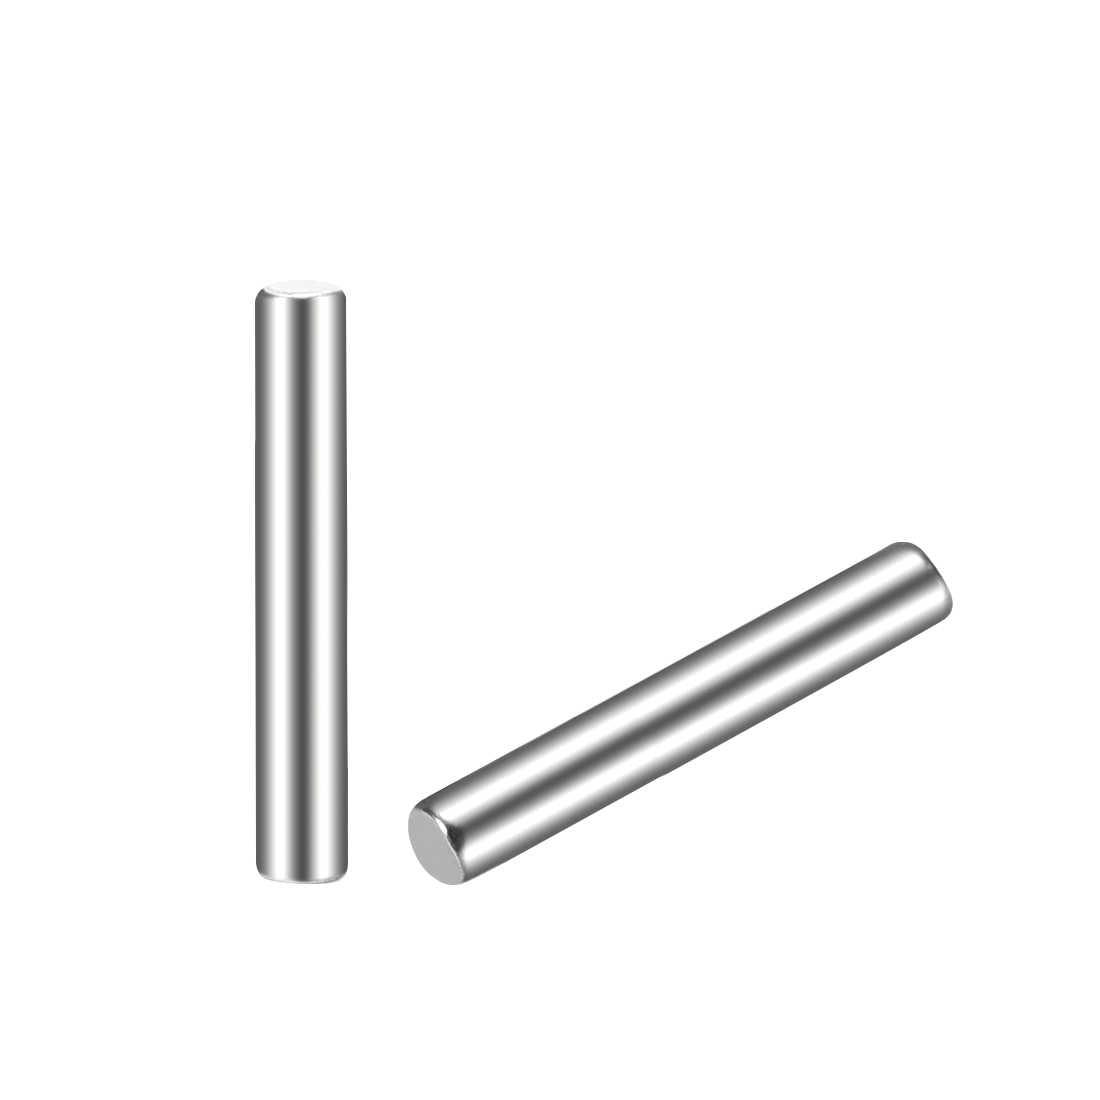 Stainless Steel Parallel Round Dowel Pins Fastener Elements 5mm x 40mm